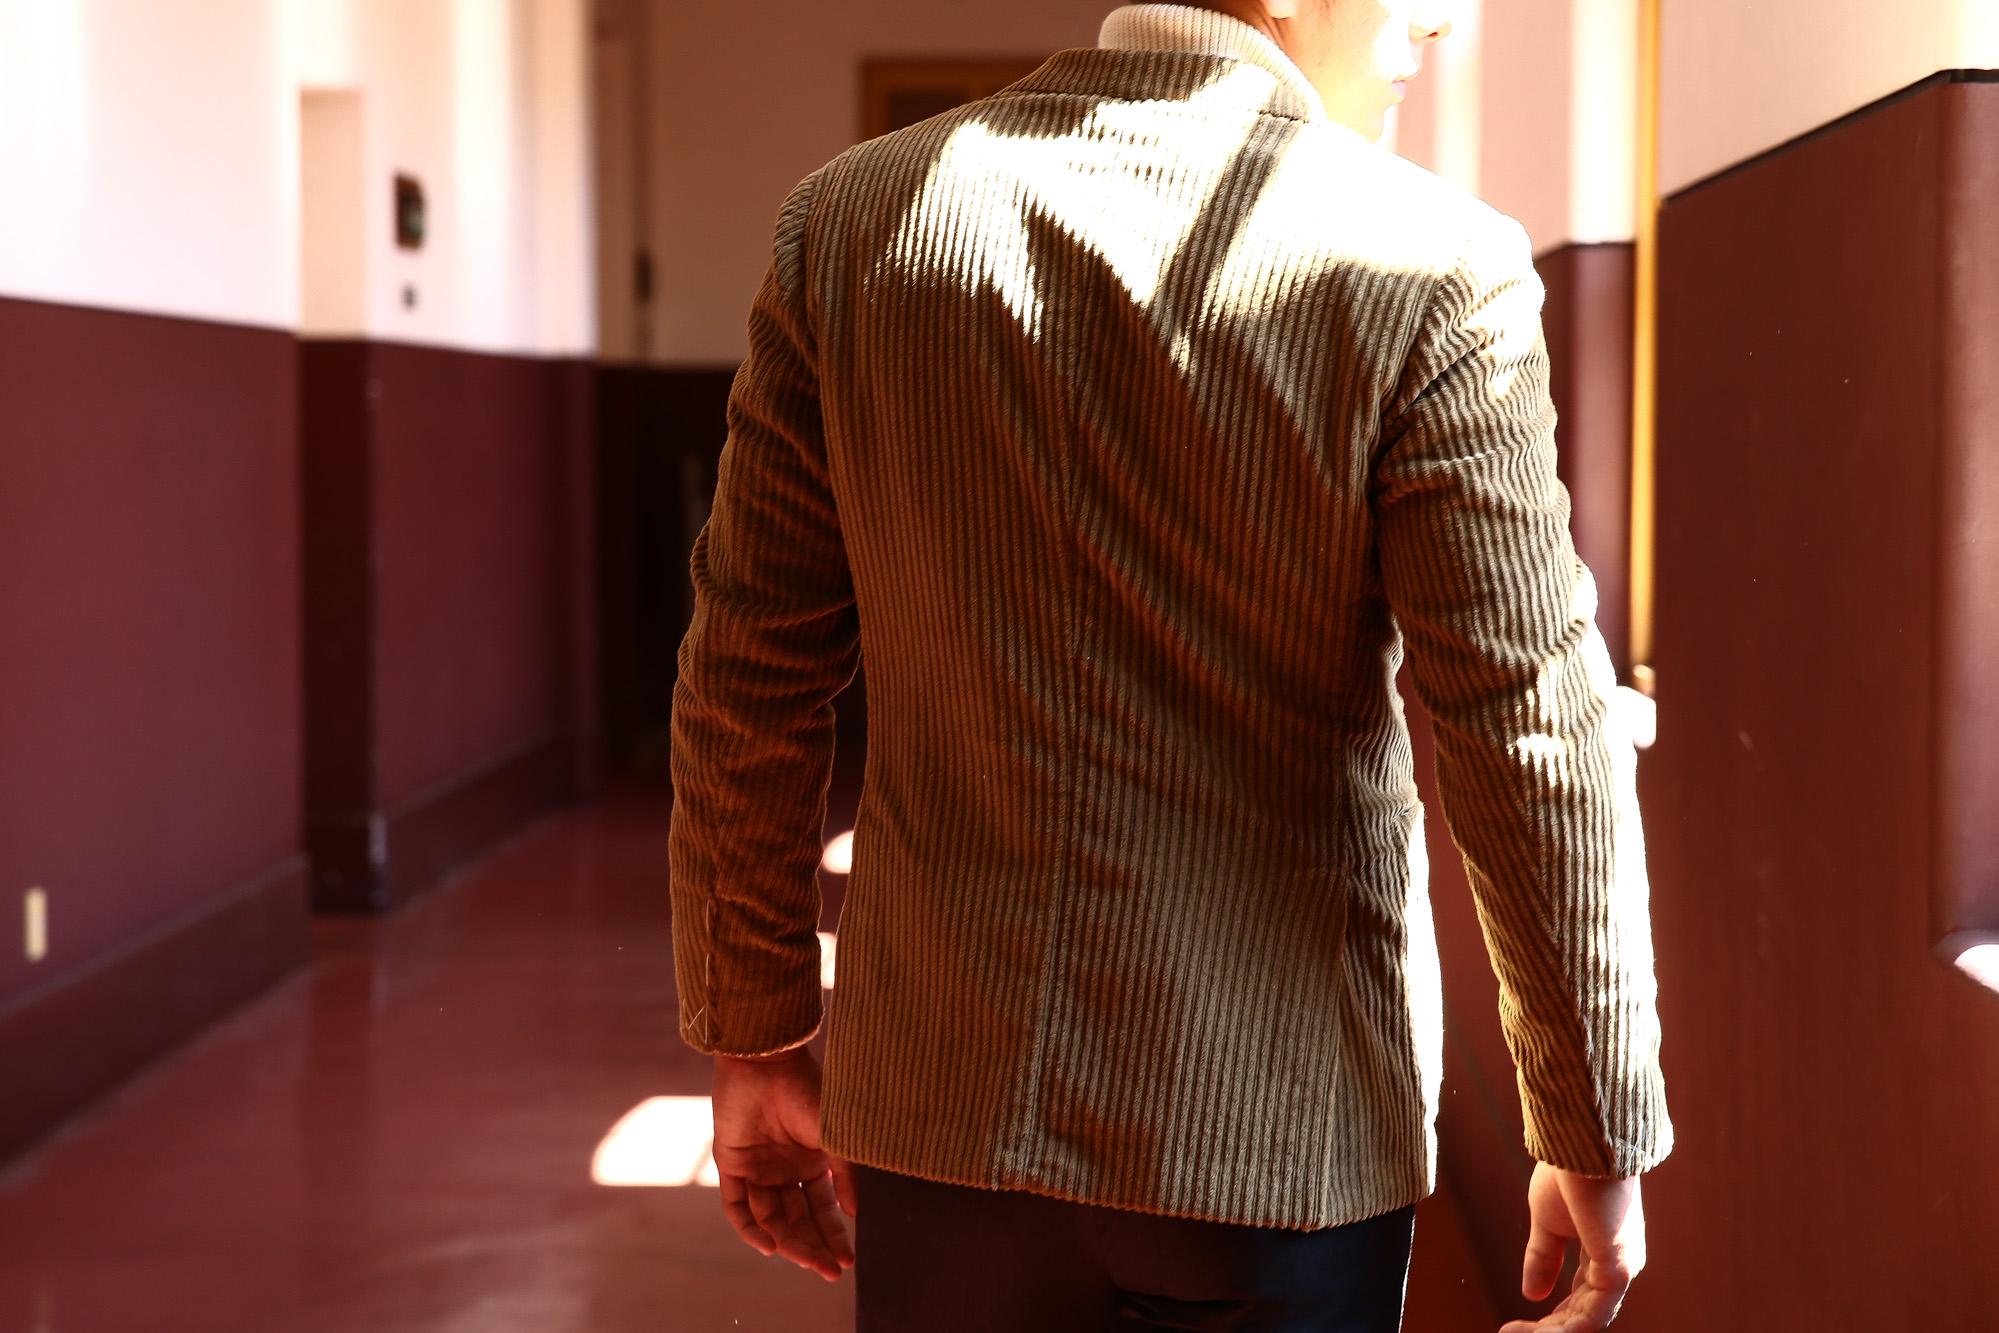 MONTEDORO (モンテドーロ) Corduroy 2B Jacket Wale Garment dyed Corduroy テーラード コーデュロイ ジャケット BEIGE (ベージュ・756) 2016 秋冬新作 のコーディネート画像。愛知 名古屋 ZODIAC ゾディアック LEON レオン モンテドーロ 名古屋